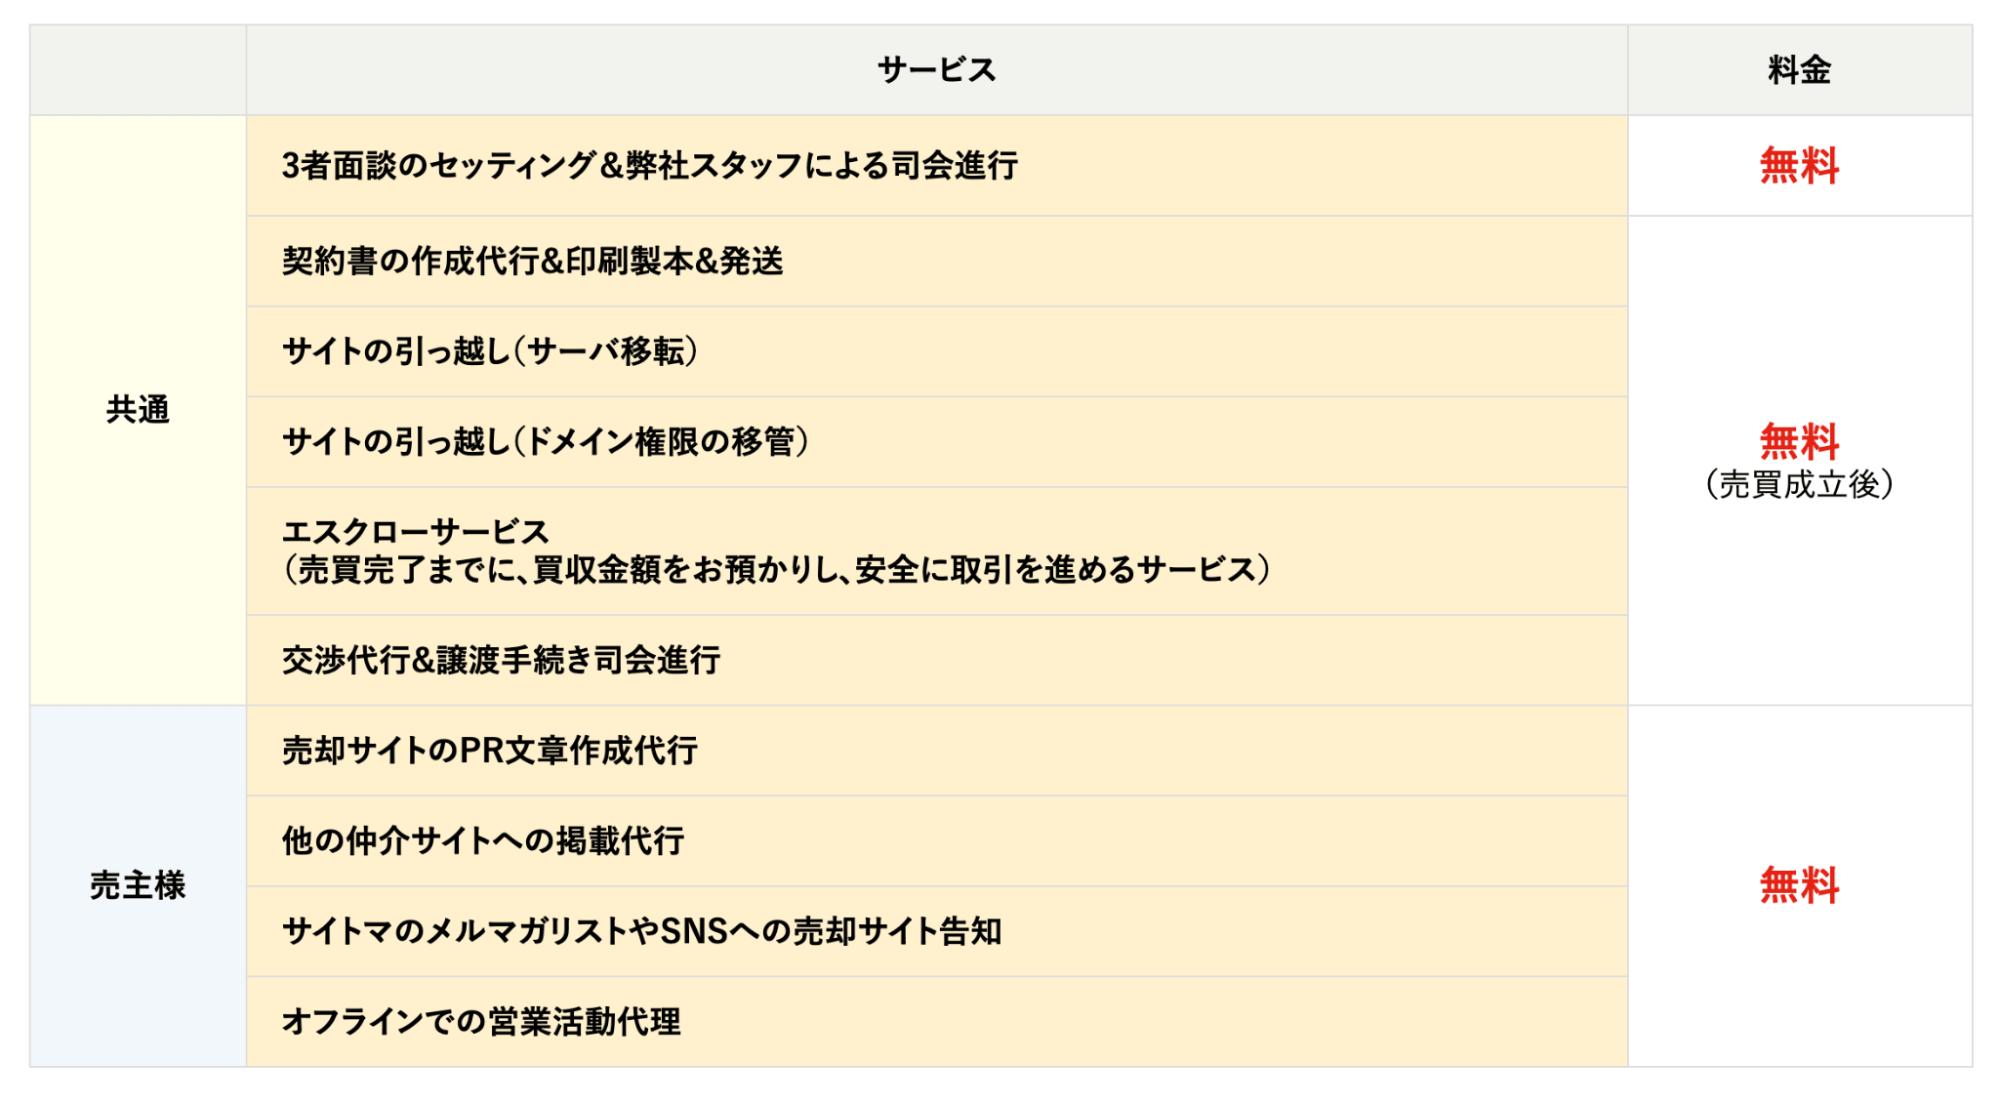 image1-min.png